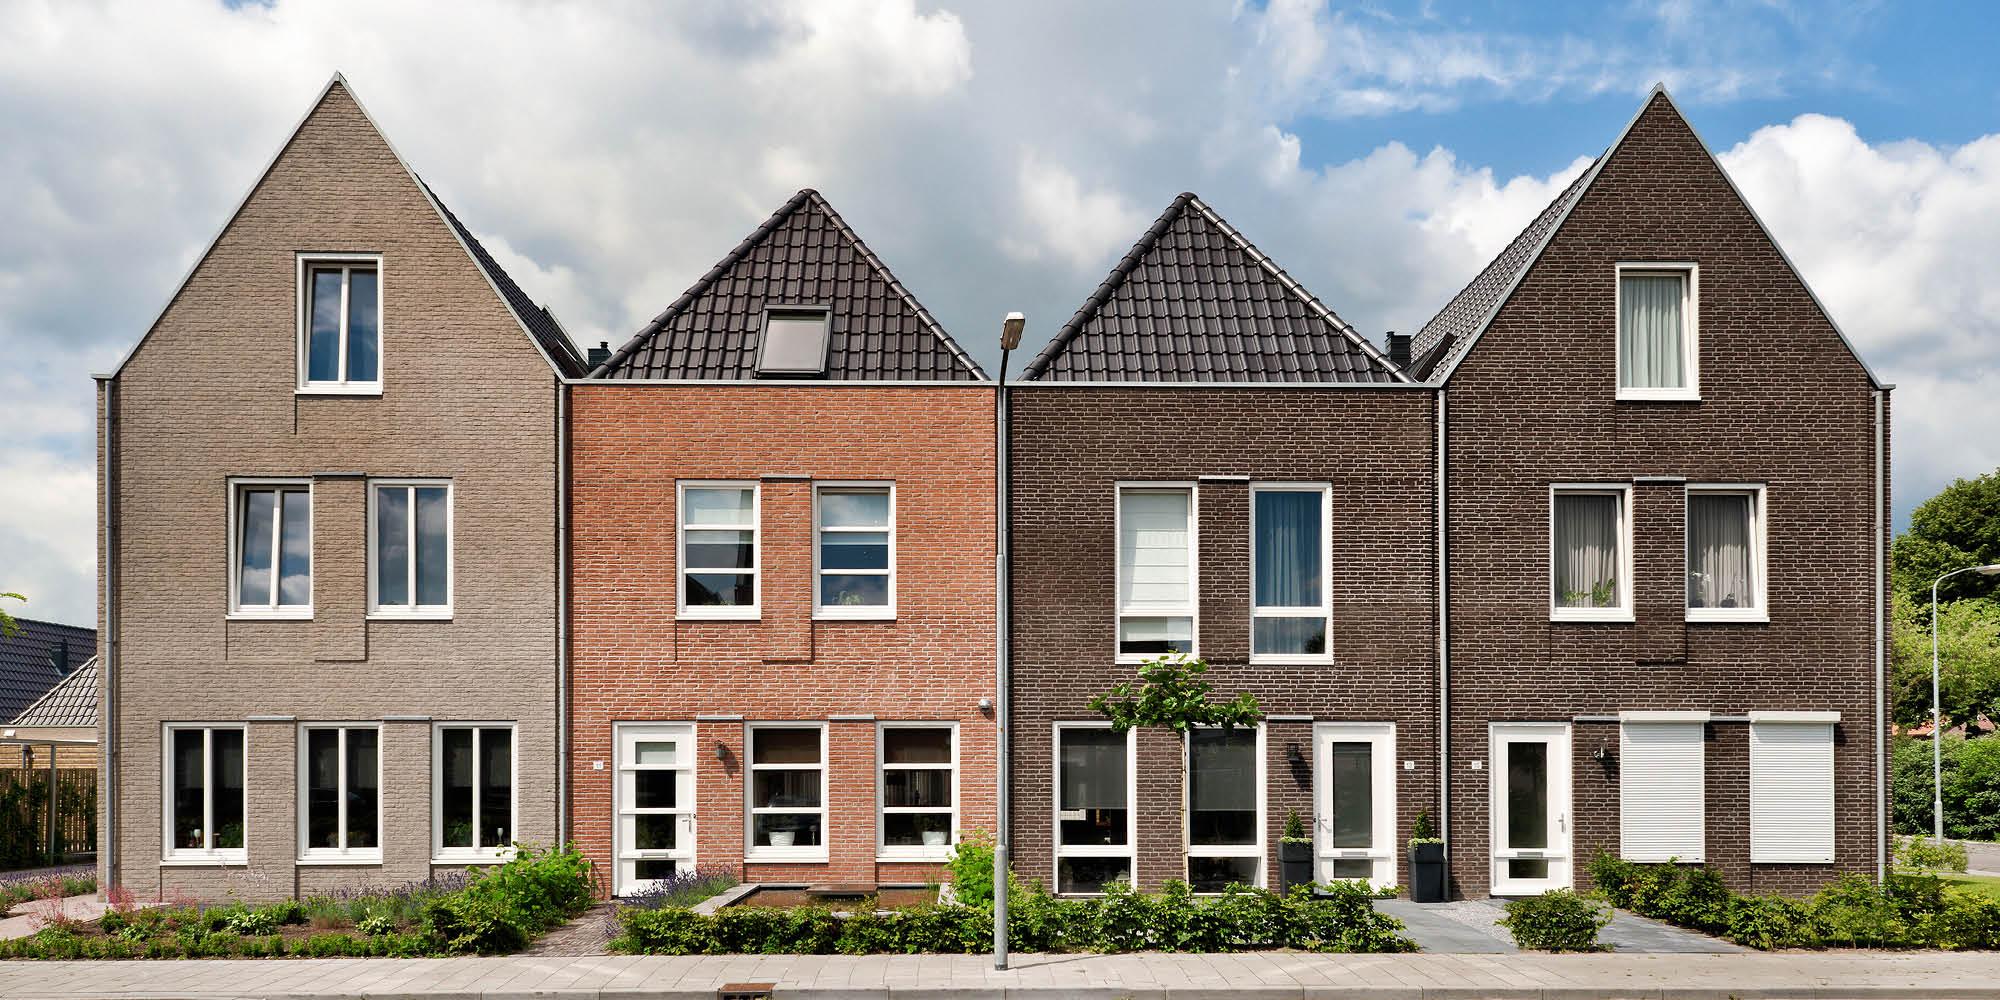 151-Leesonhof-Ederveen2